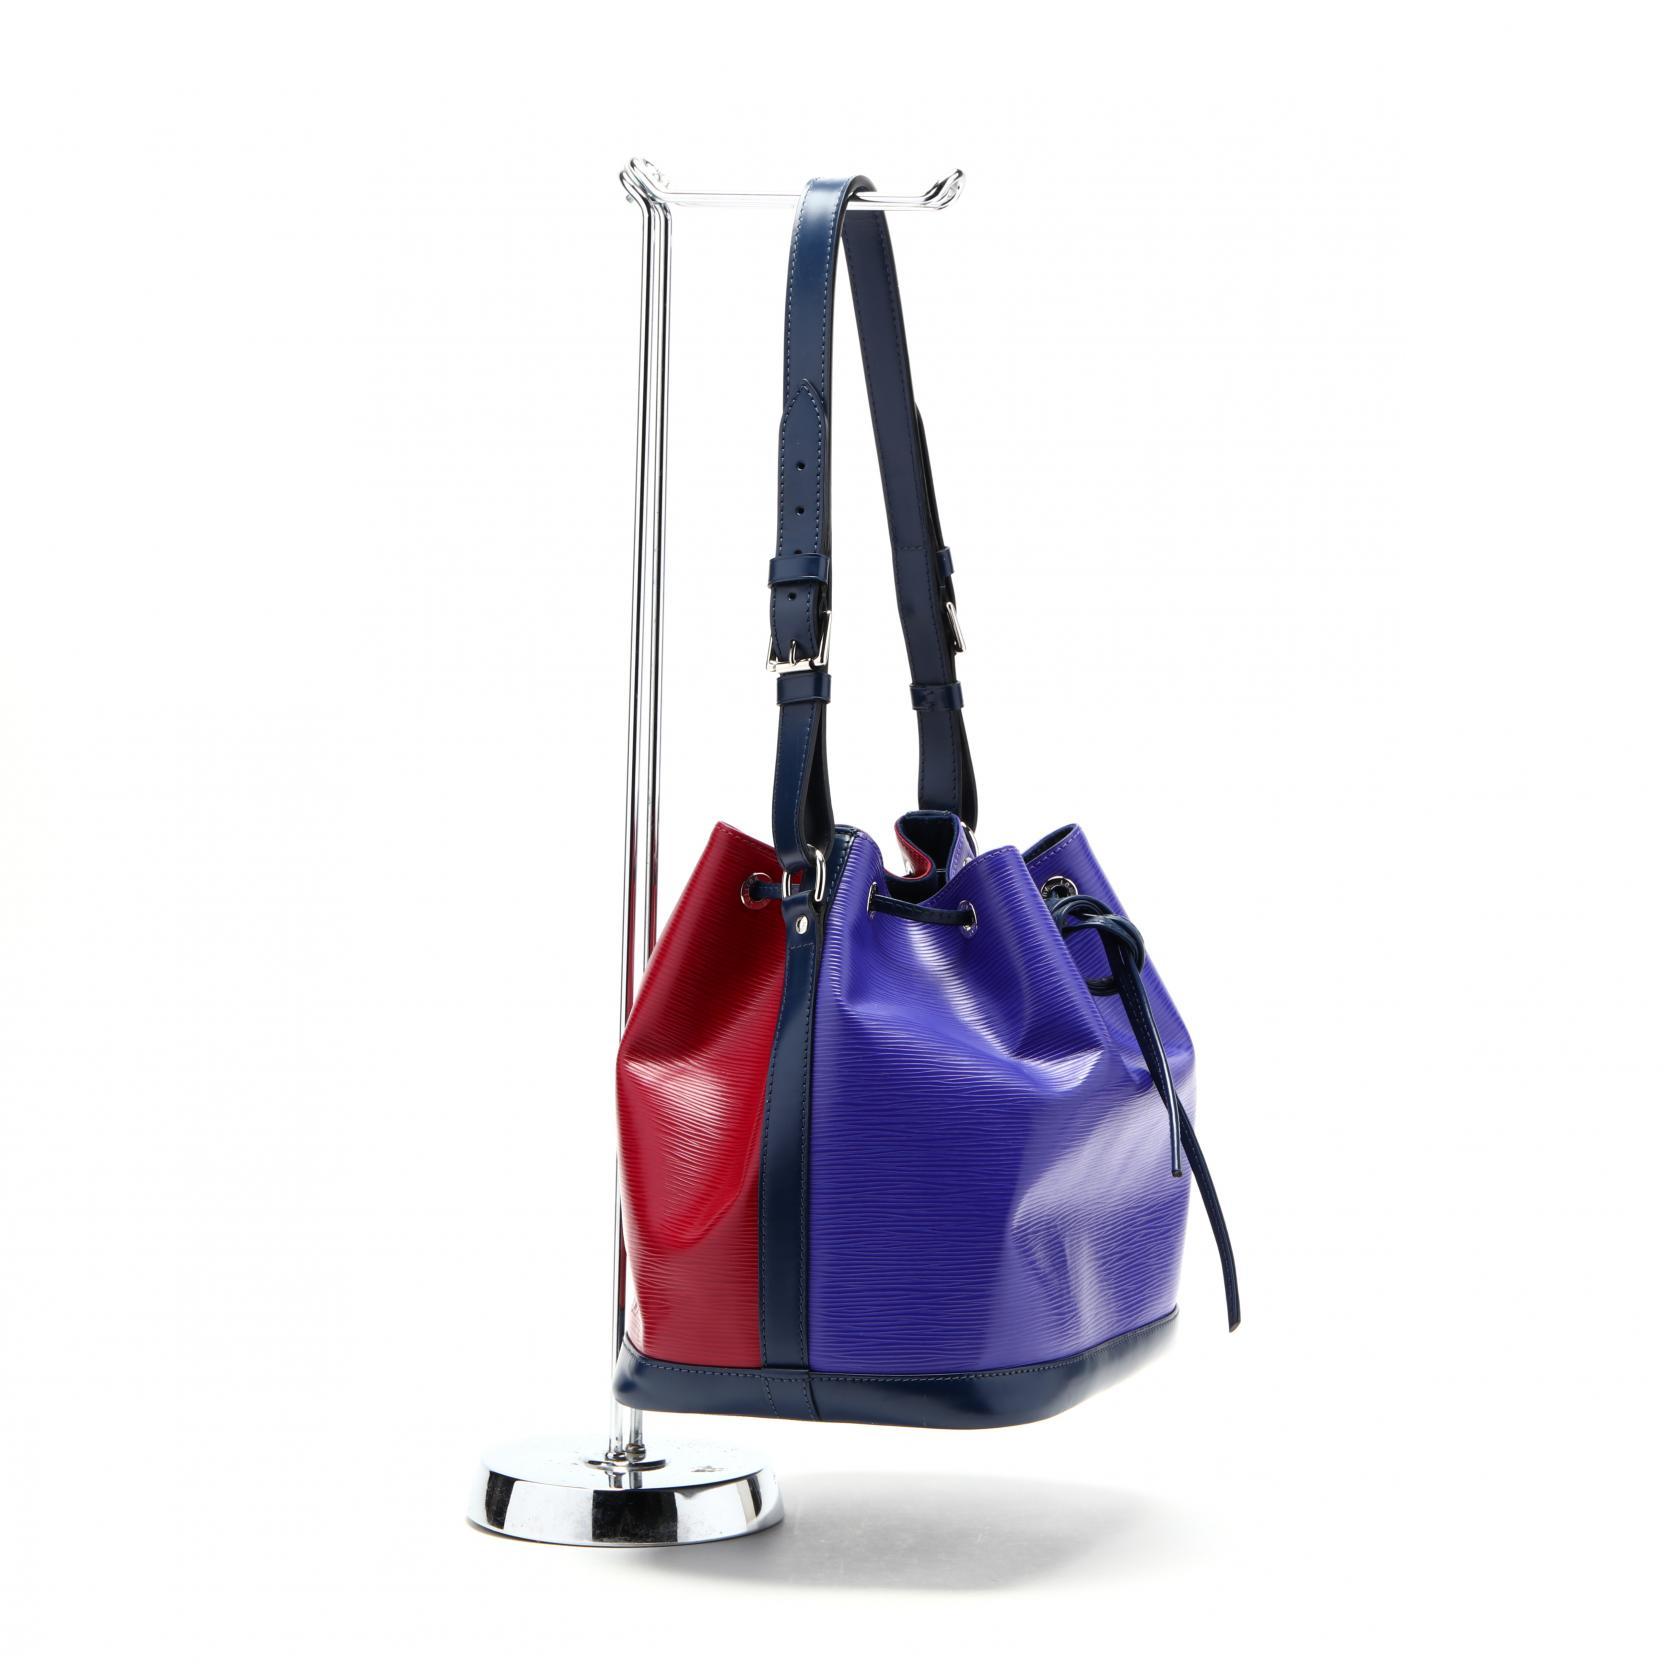 tricolor-i-petit-noe-figue-fuchsia-indigo-i-drawstring-shoulder-bag-louis-vuitton